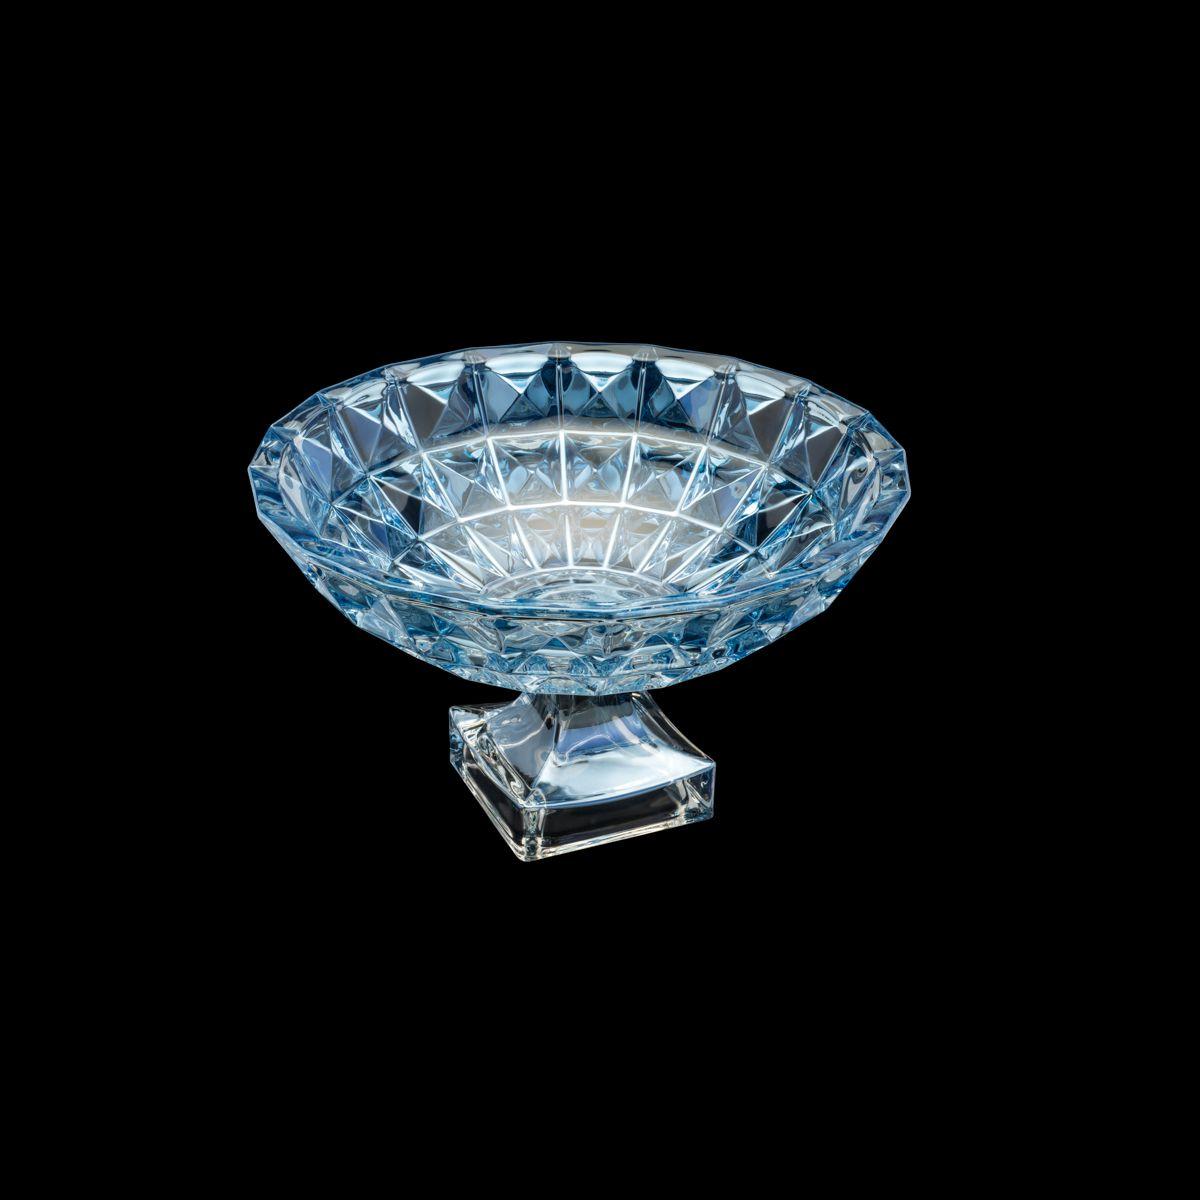 Centro de Mesa de Cristal de Chumbo com Pe Diamant Azul 32,5x19,5cm